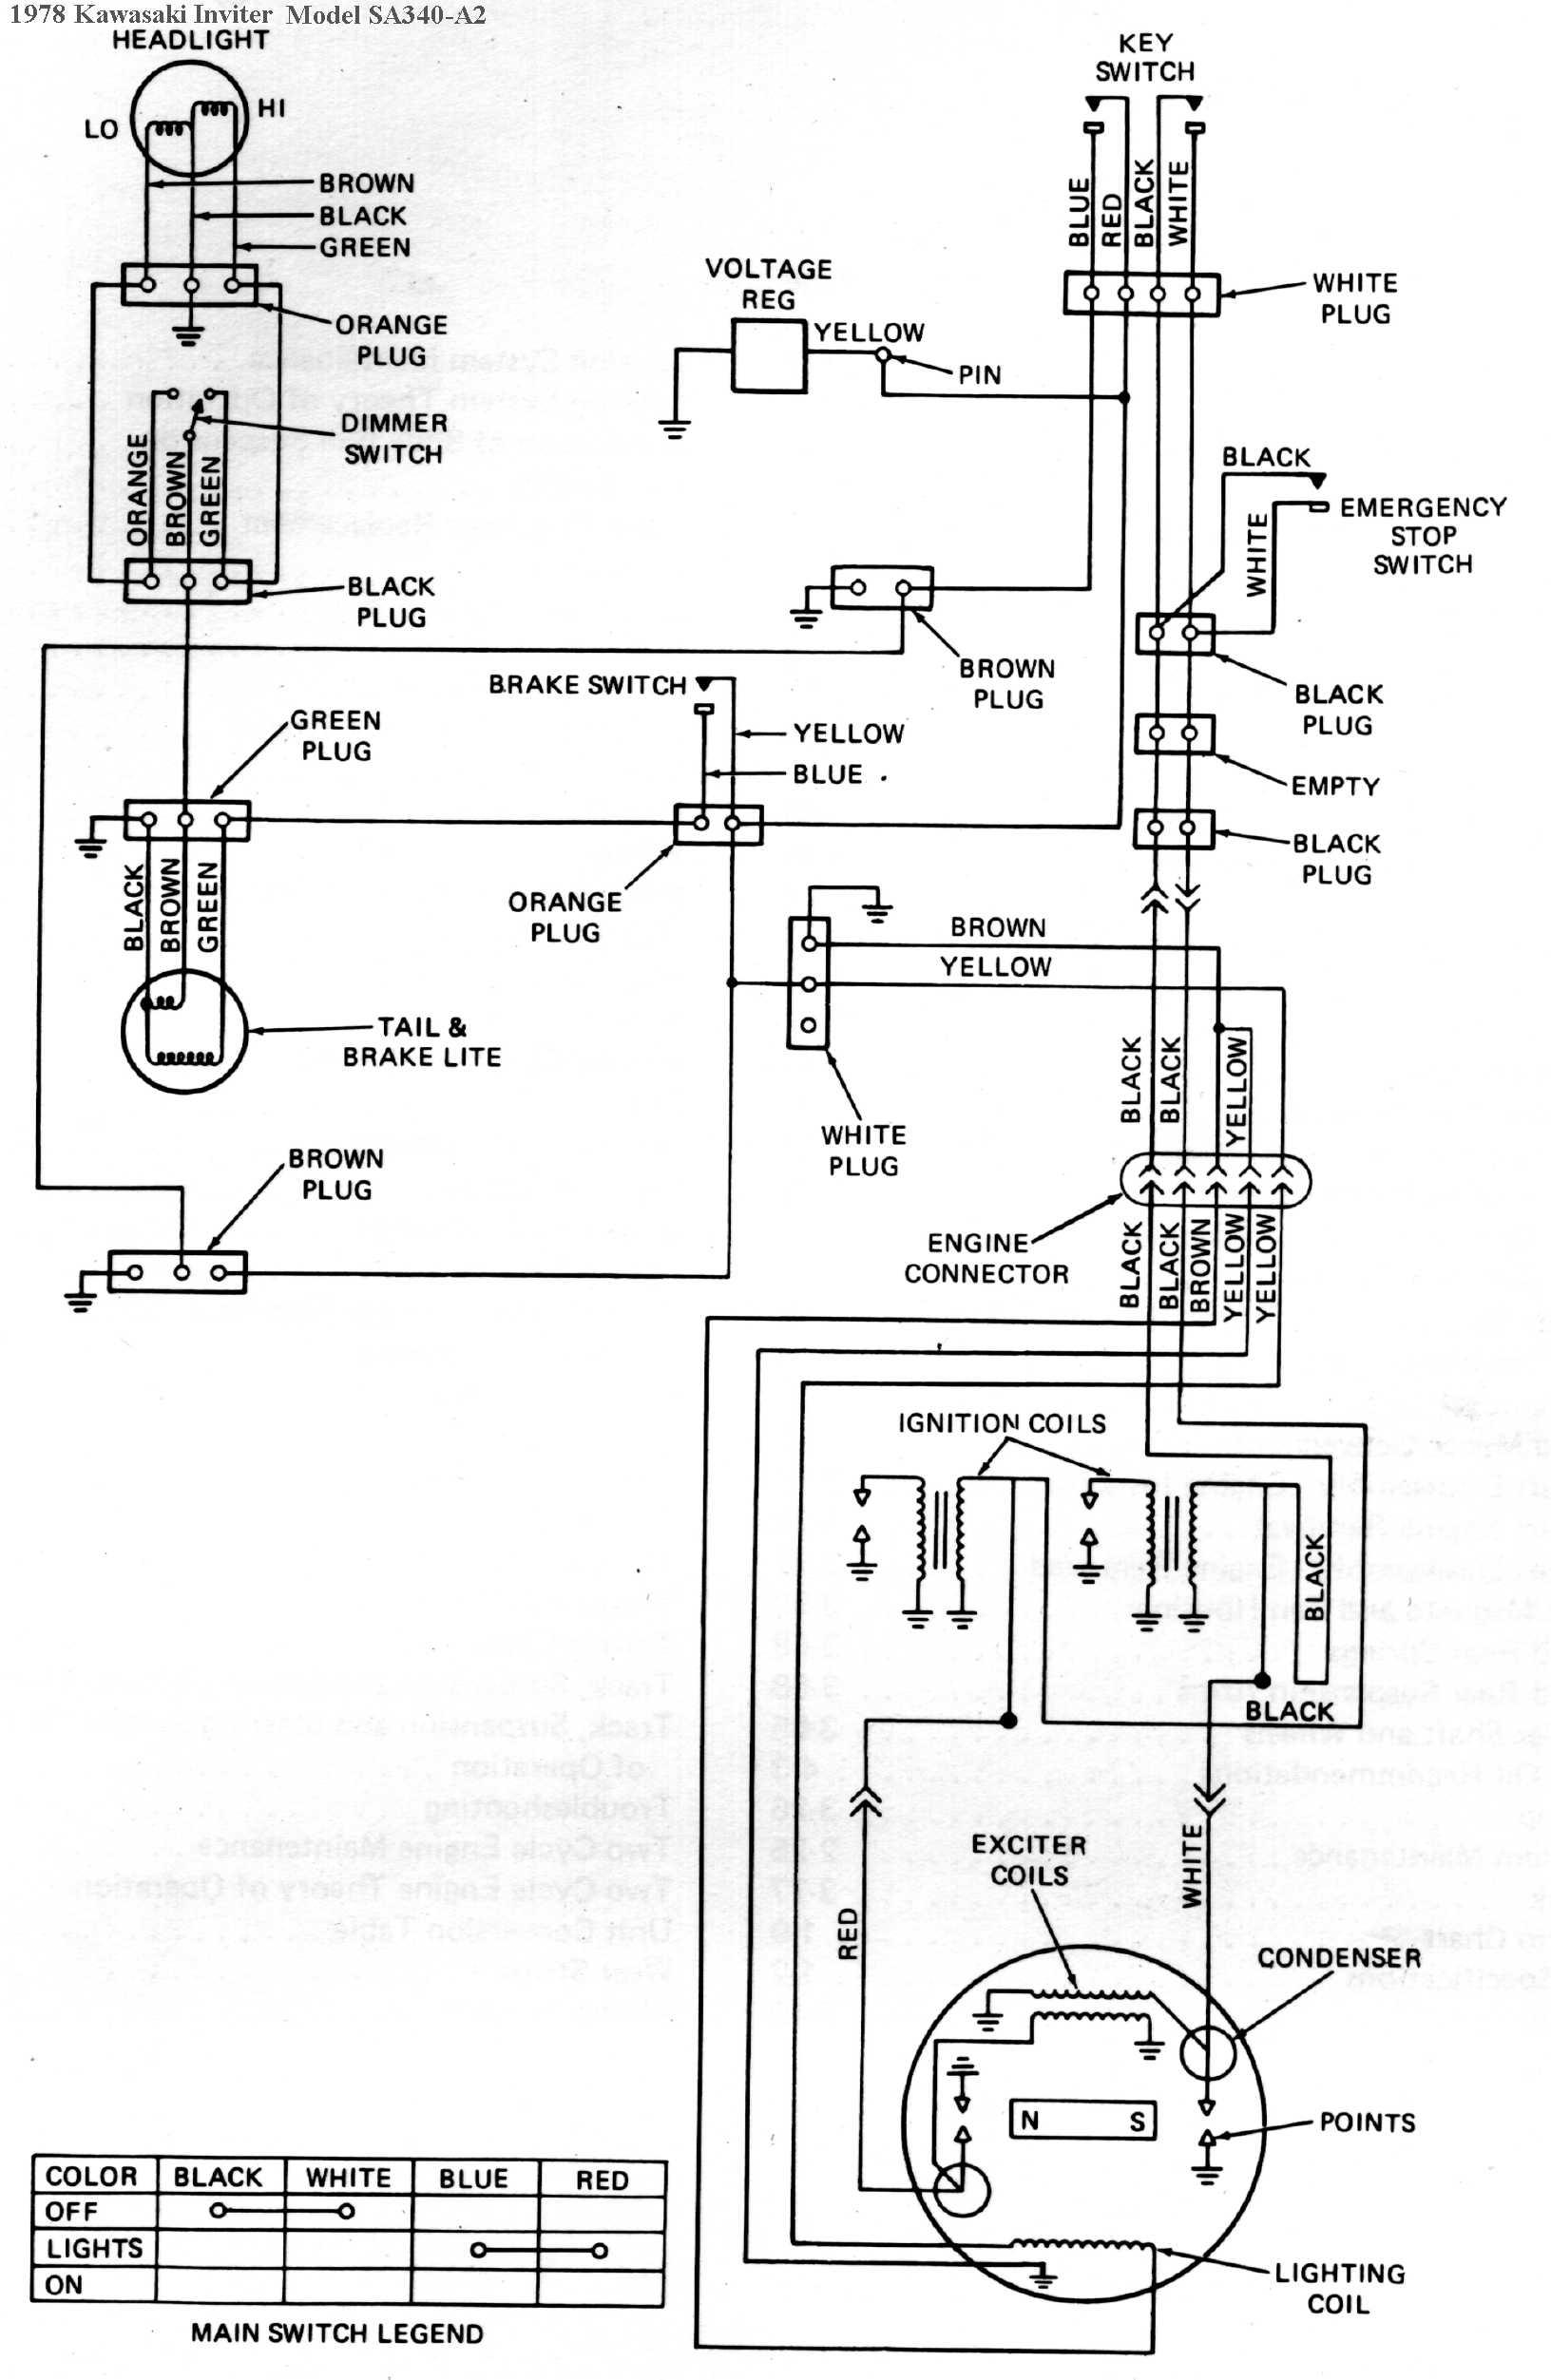 06EB9 Kz1300 Wiring Diagram